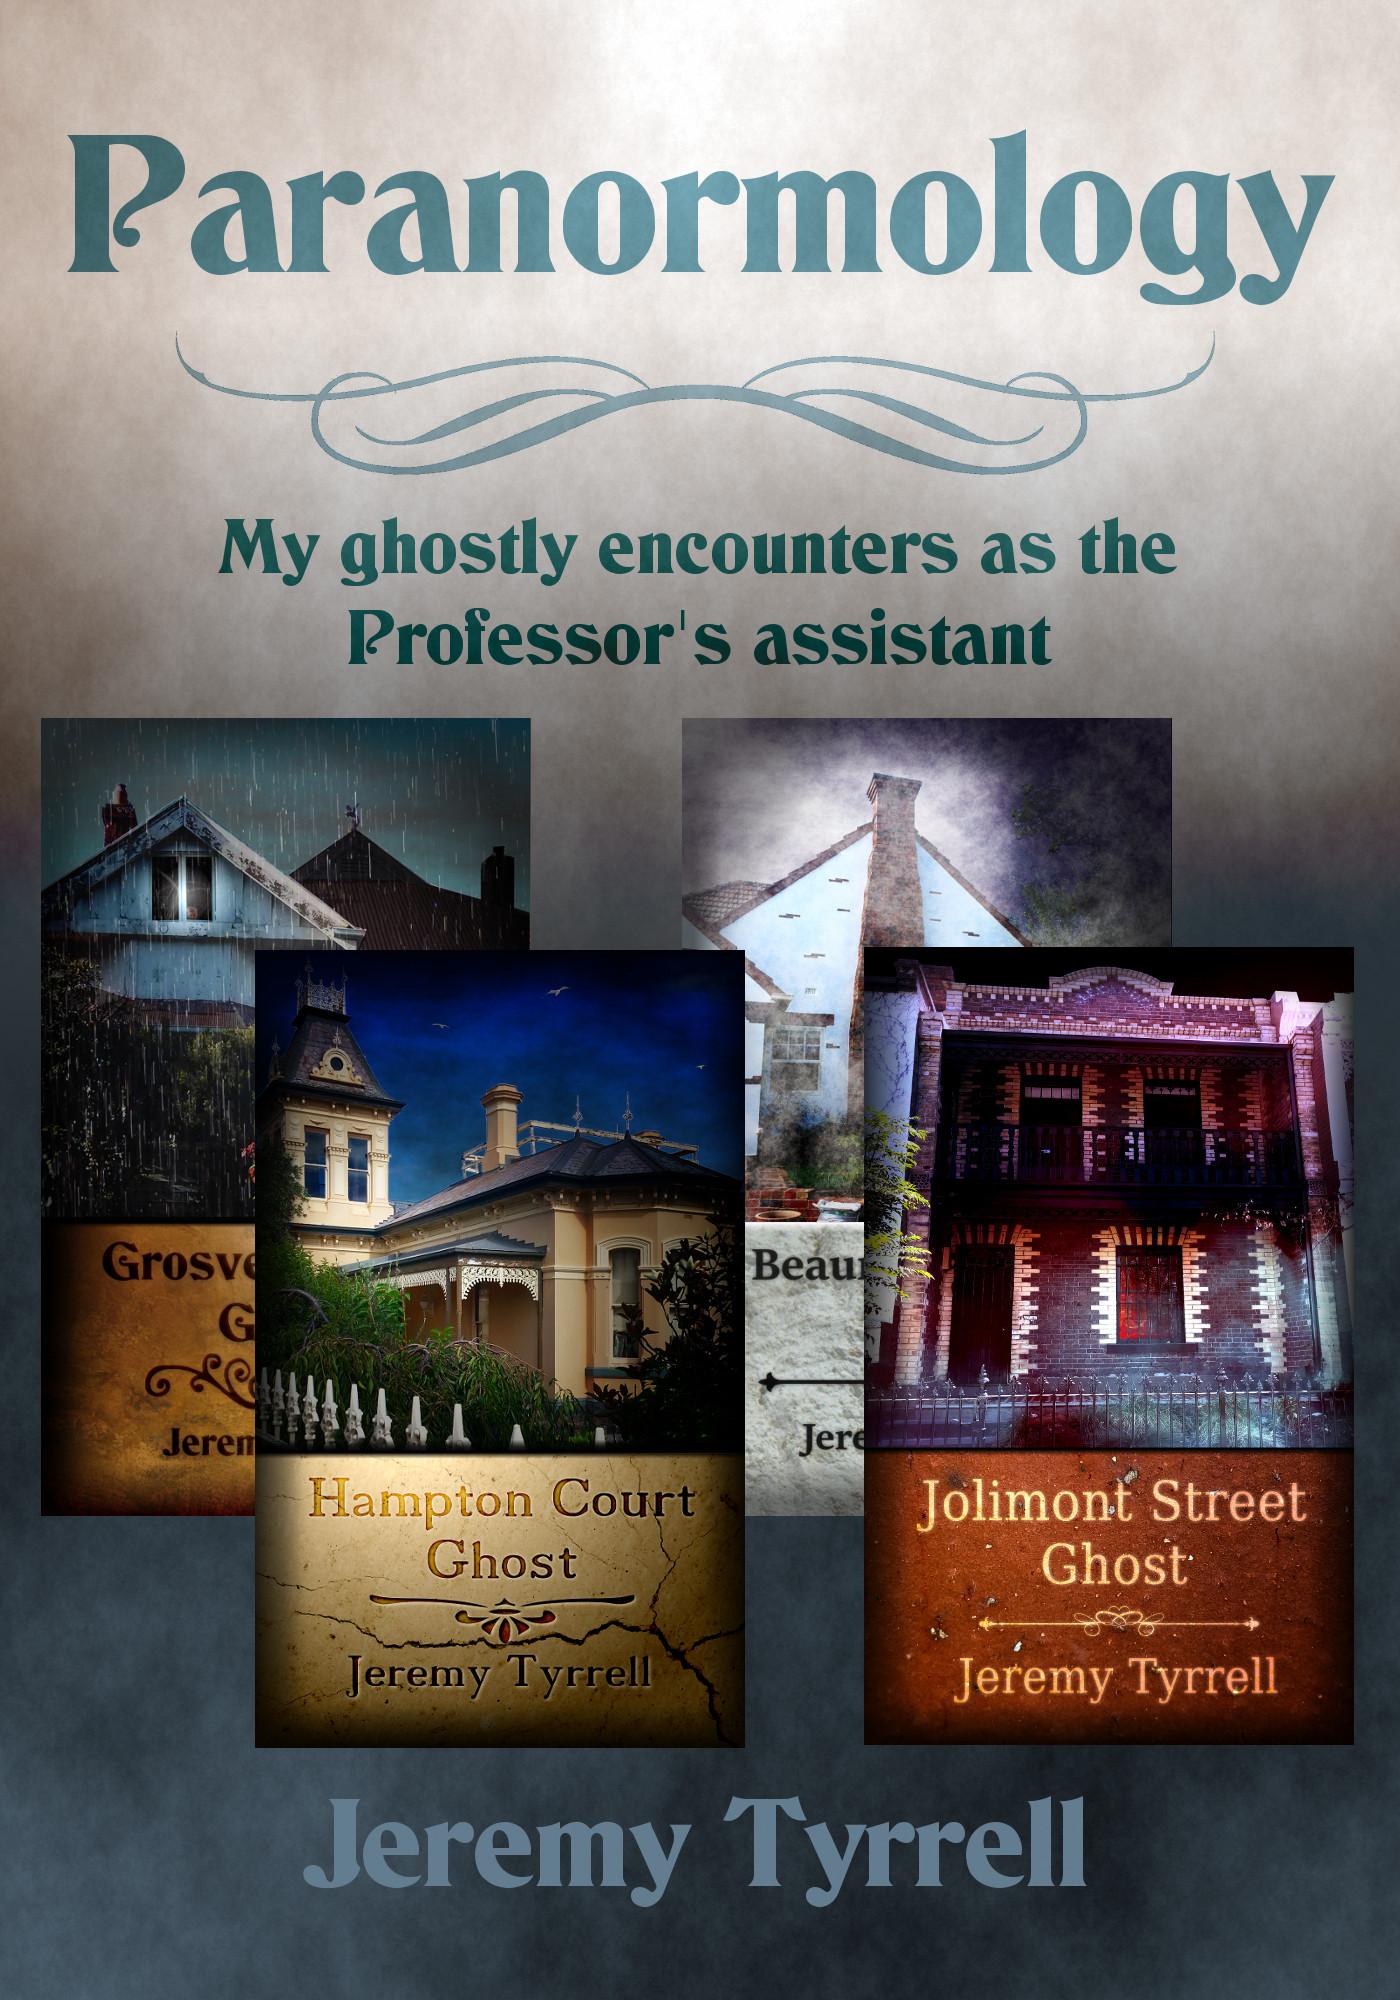 Jolimont Street Ghost – Free at last!